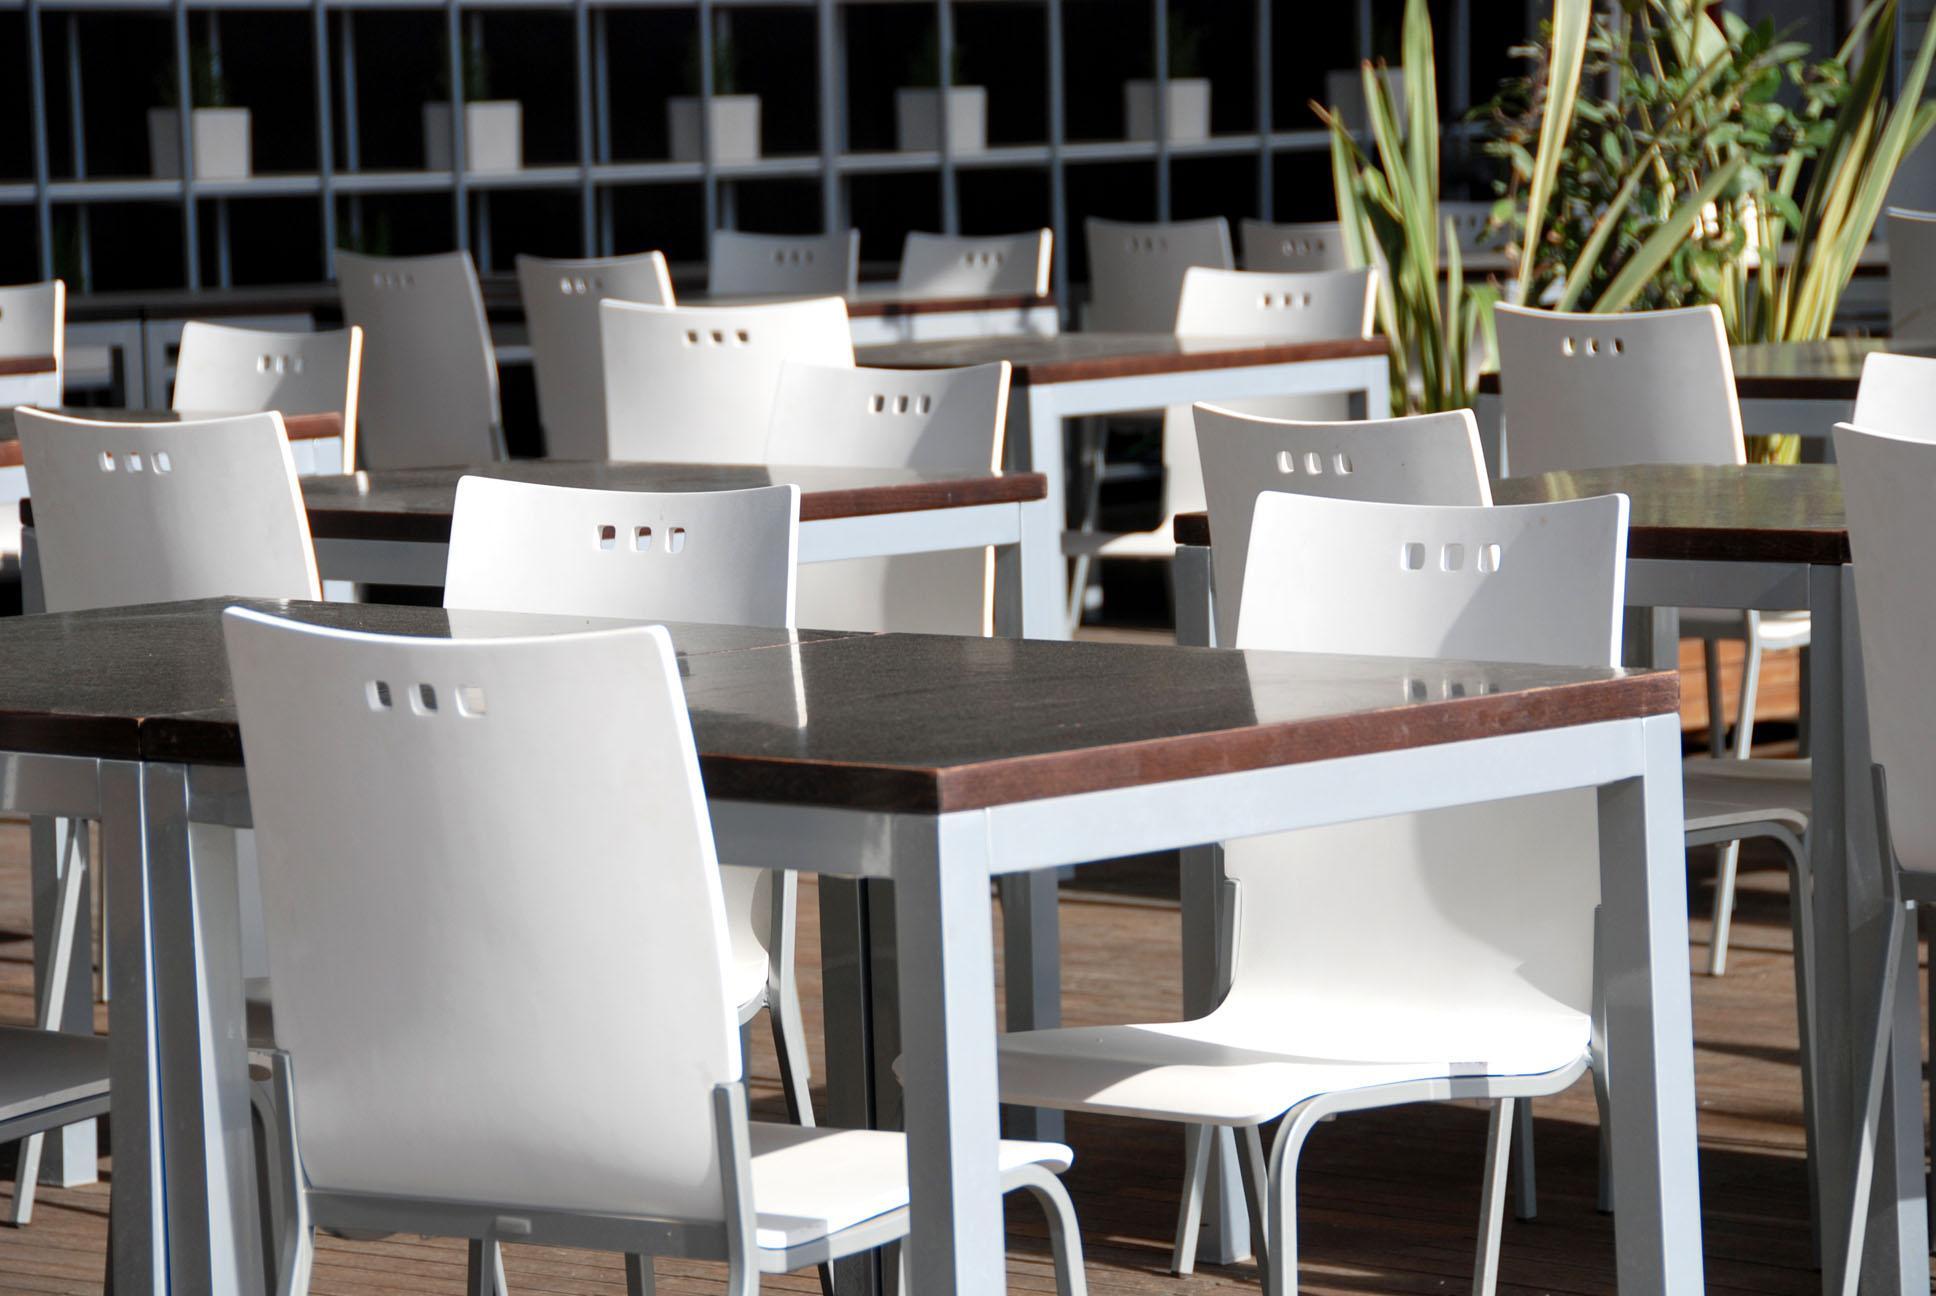 Noleggio tavoli e sedie Carugate